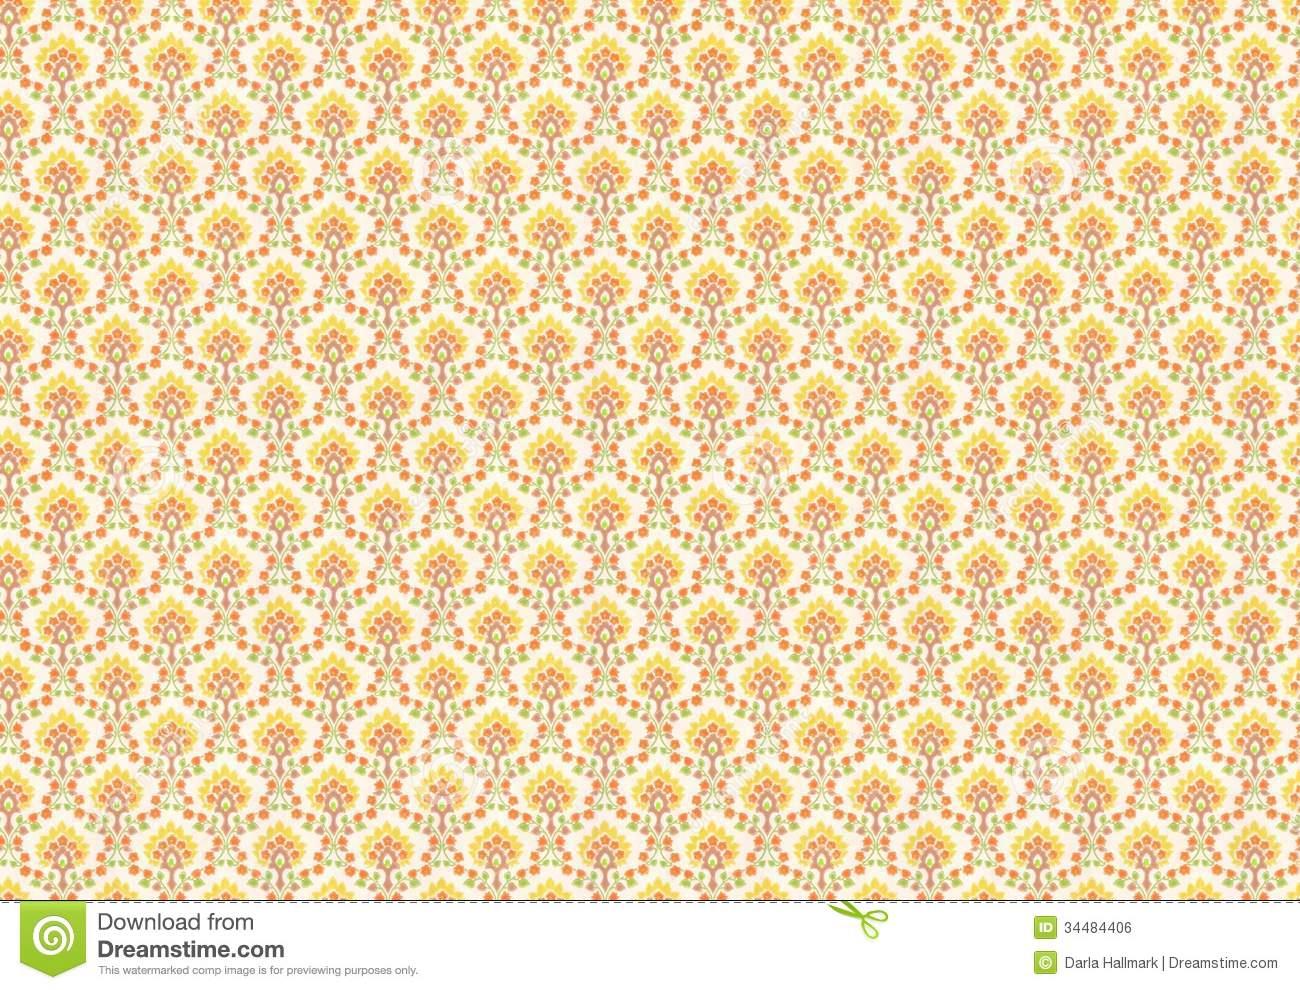 Cheap Wallpaper Wallpapers HD Quality 1300x990